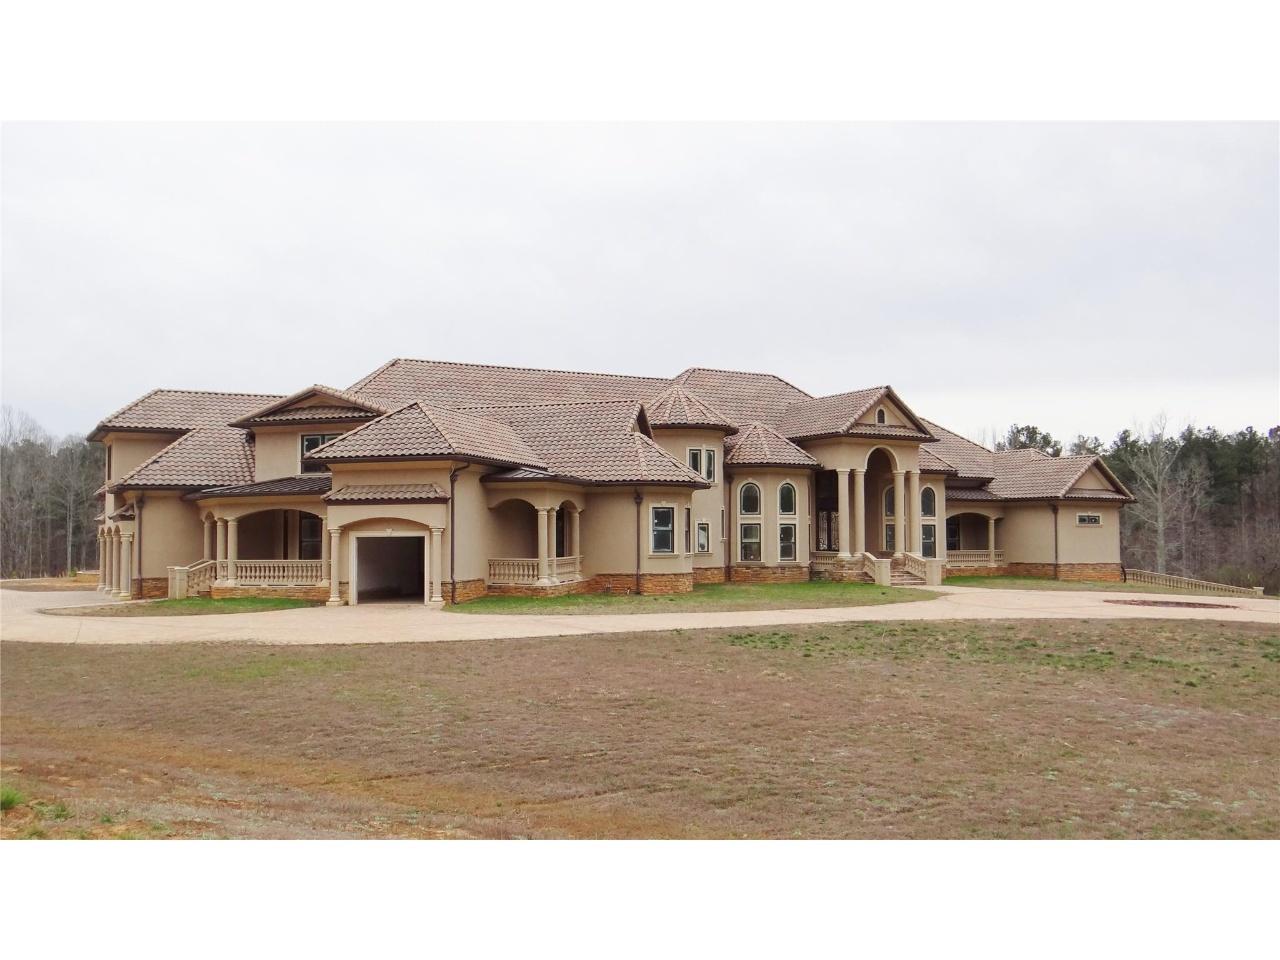 4690 Thompson Rd College Park GA 30349 1799